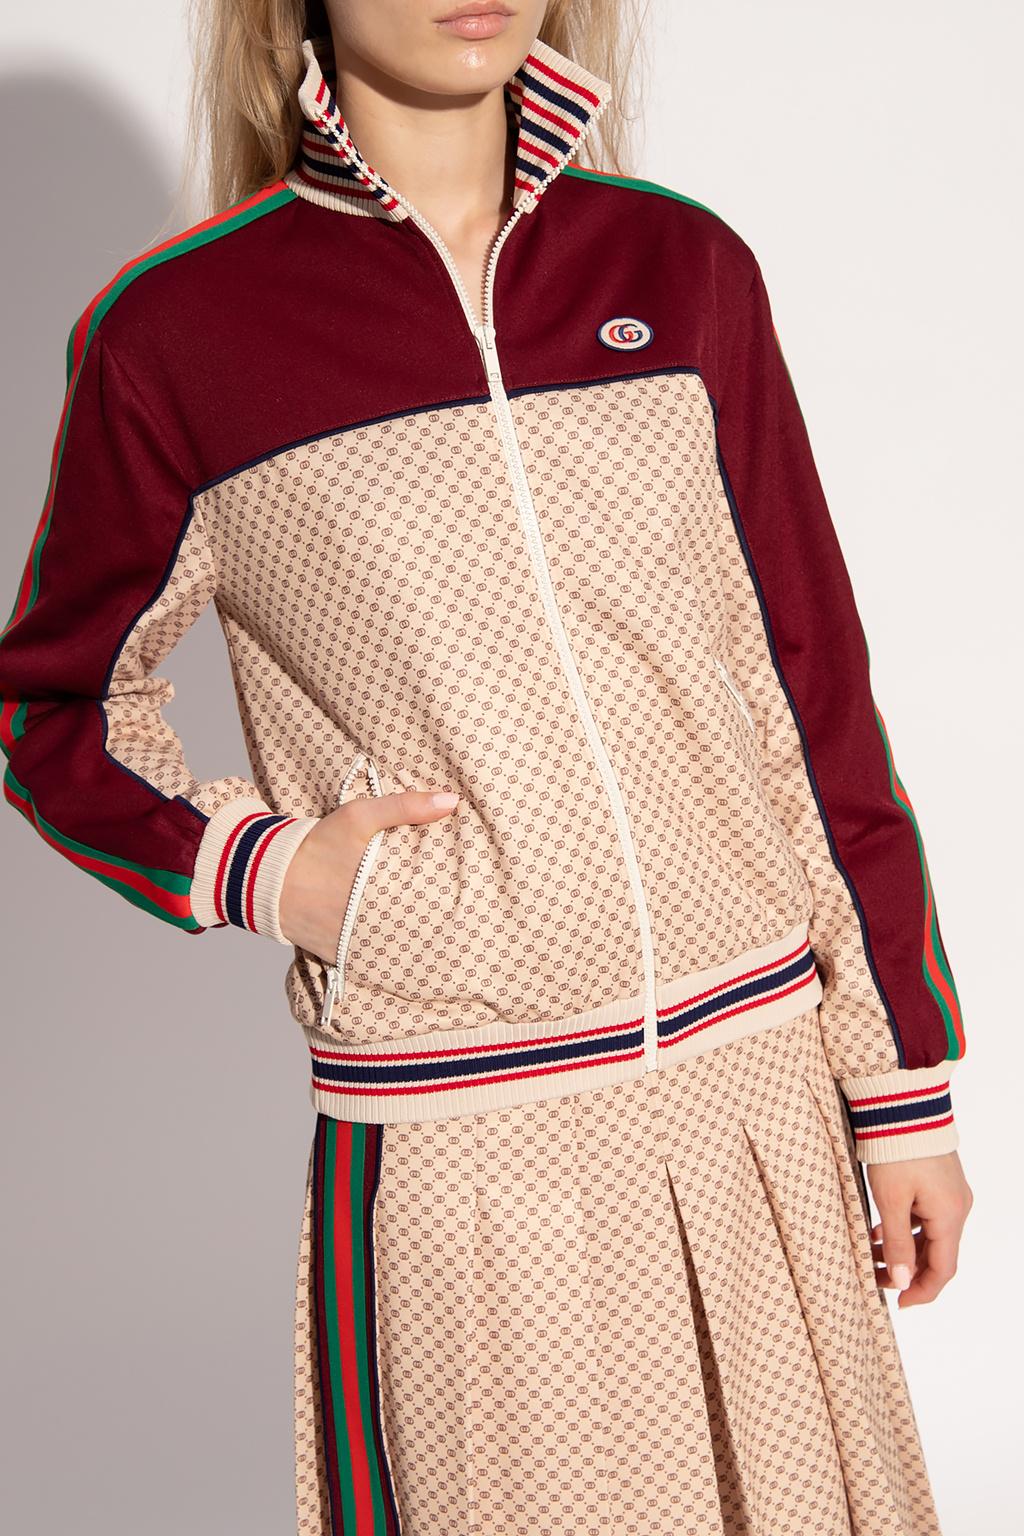 Gucci Sweatshirt with logo